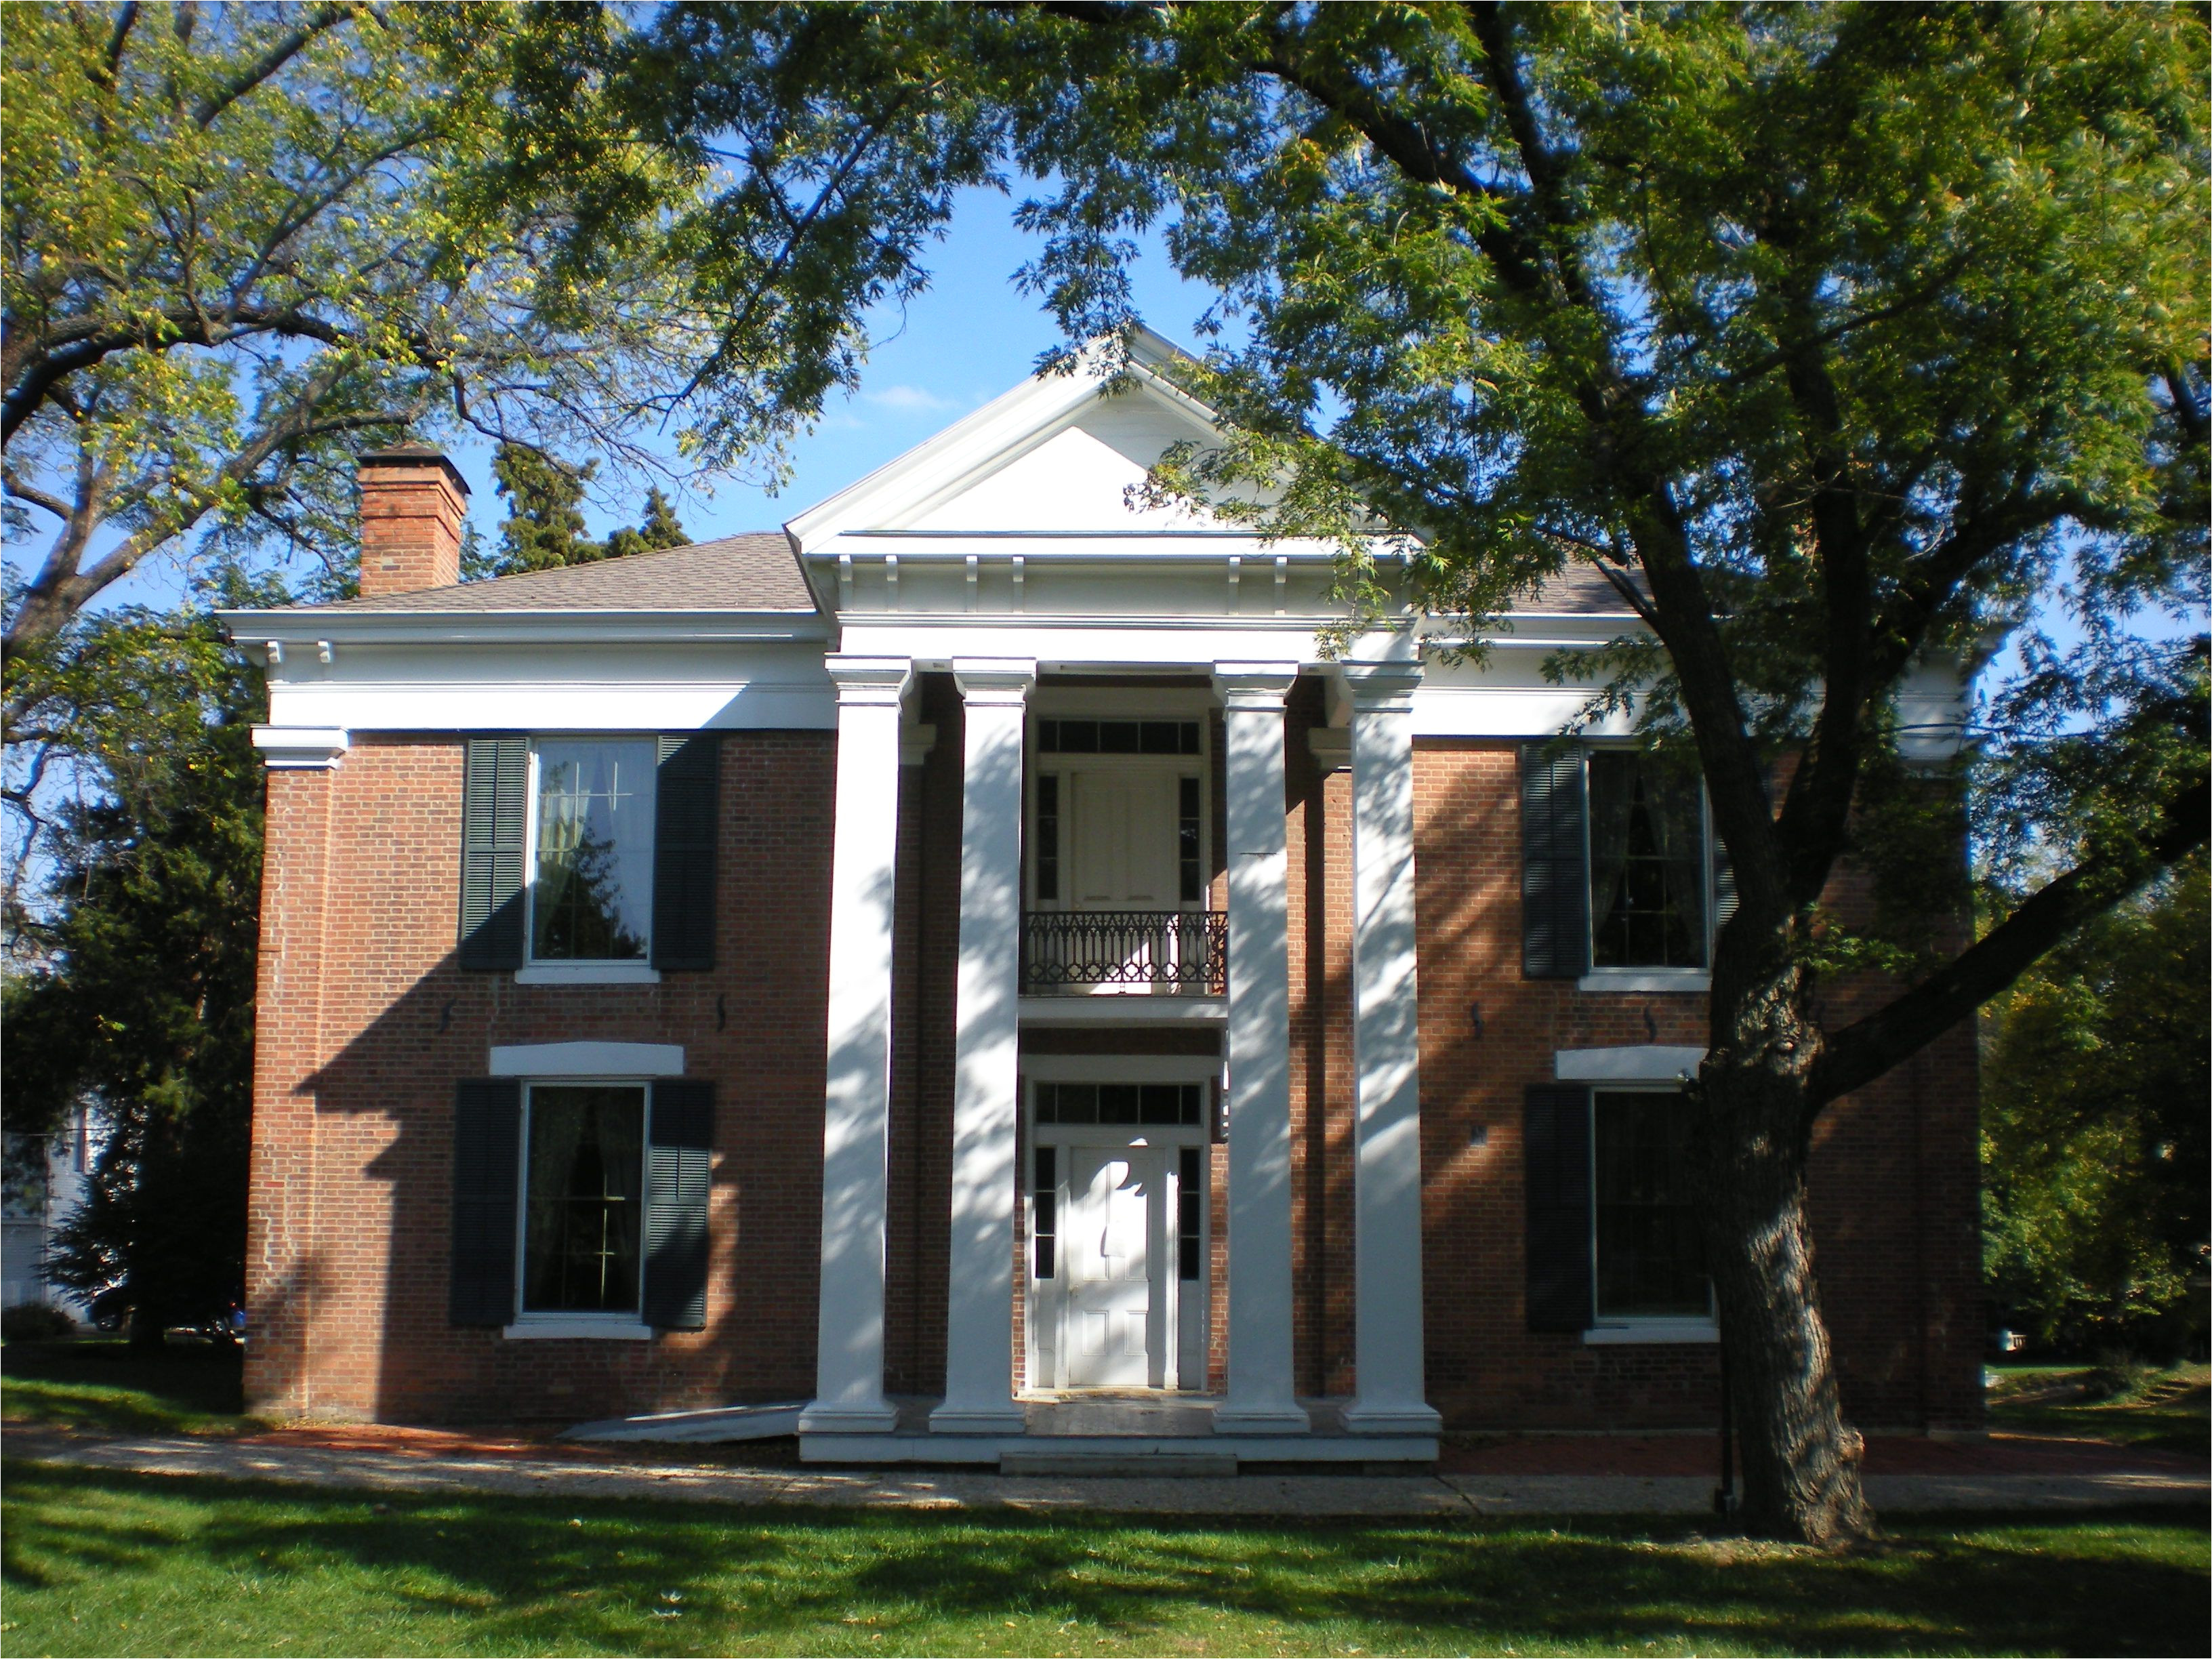 Rent to Own Homes In north Kansas City Mo Kansas City S Historic Homes